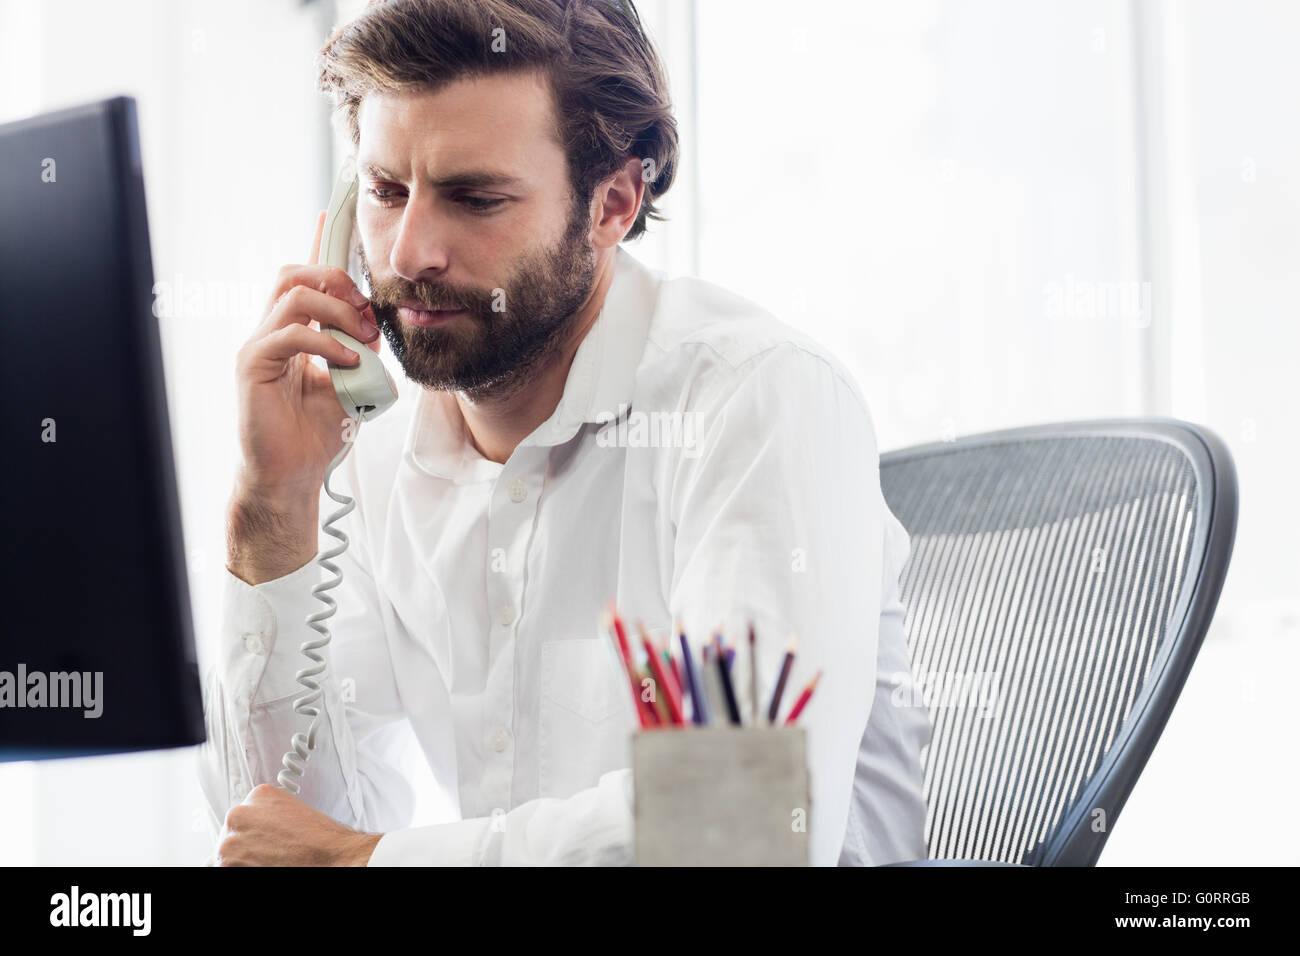 A man having a phone call - Stock Image